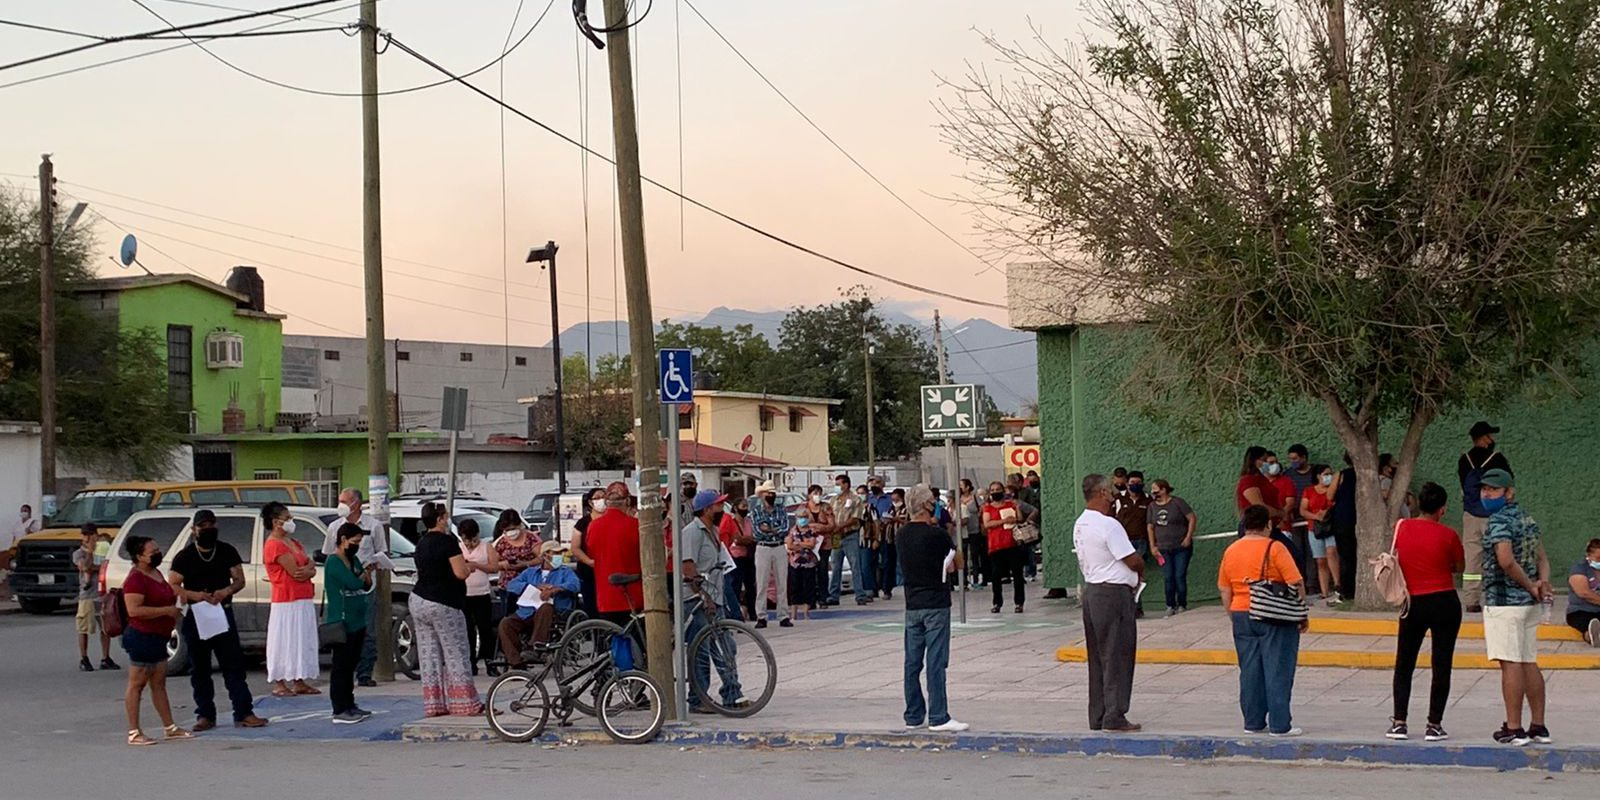 Continúa IMSS con protocolos sanitarios en clínica 9 de Frontera